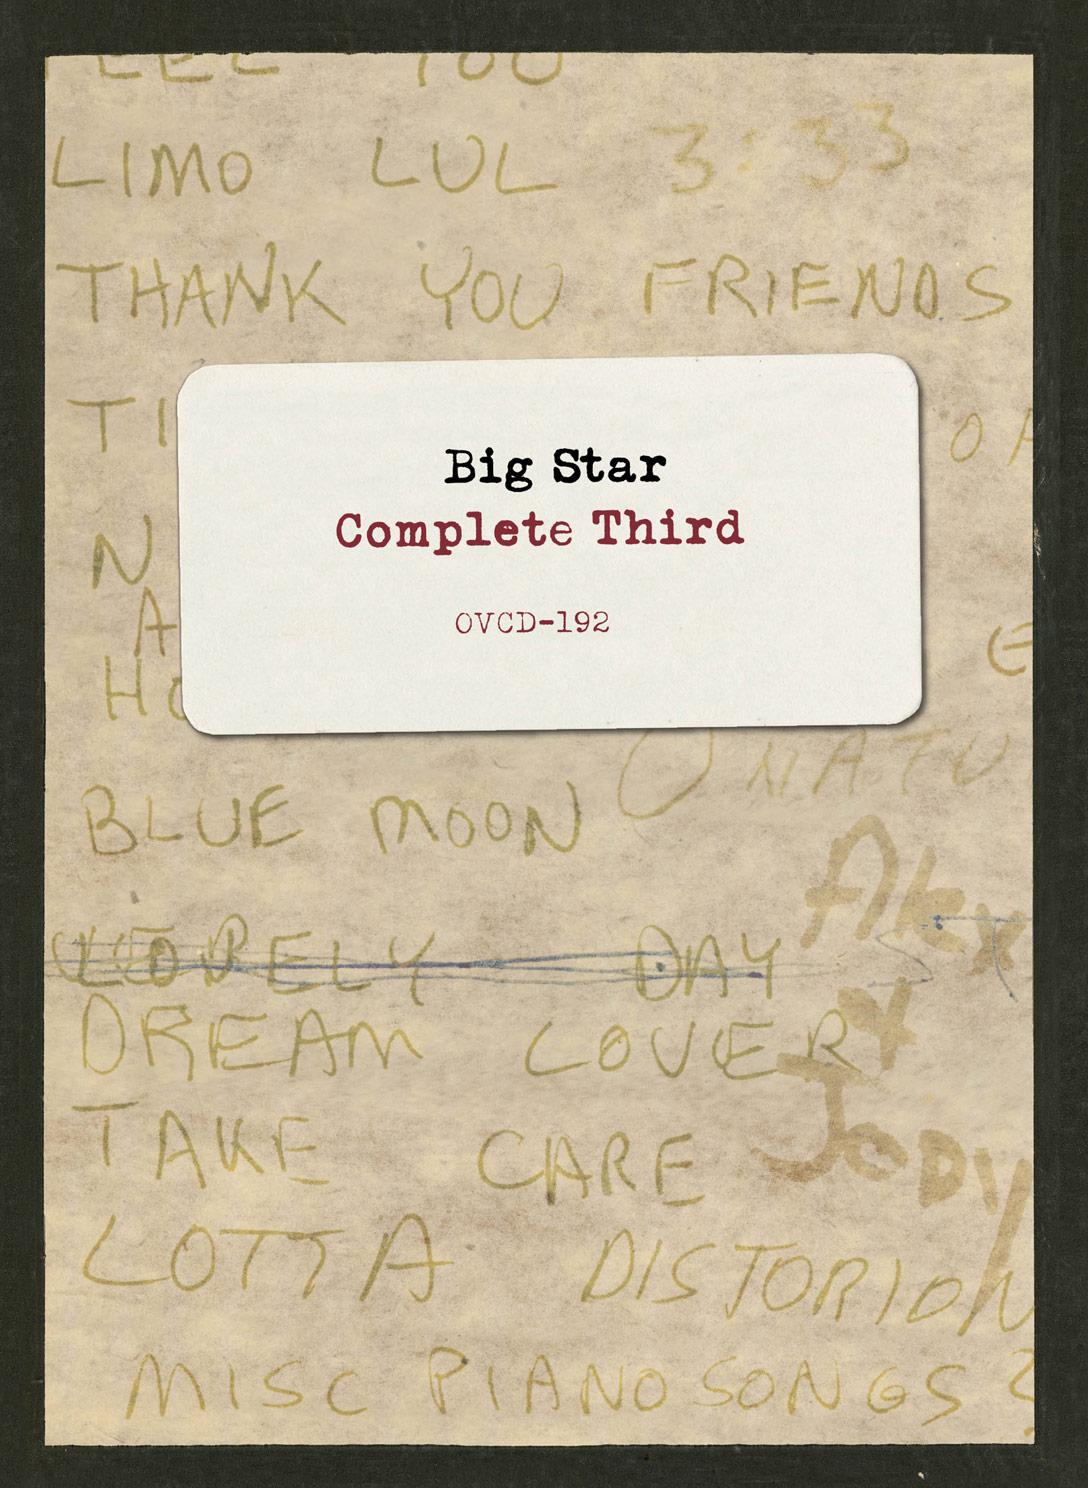 Big Star - Complete Third  Release Date: October 14, 2016 Label: Omnivore Recordings  SERVICE: Mastering, Restoration NUMBER OF DISCS: 3 GENRE: Rock FORMAT: CD,LP